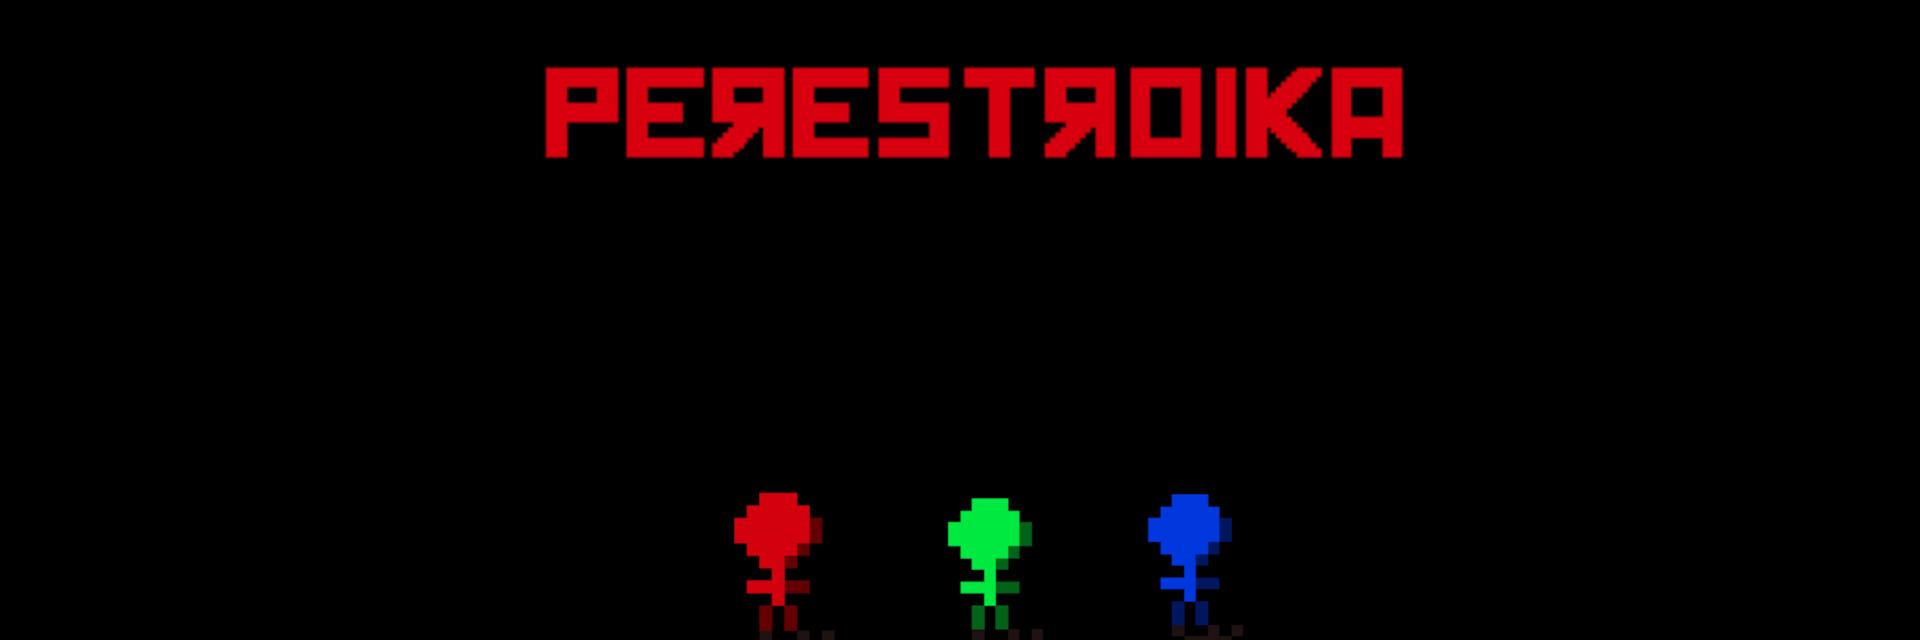 Perestroika banner